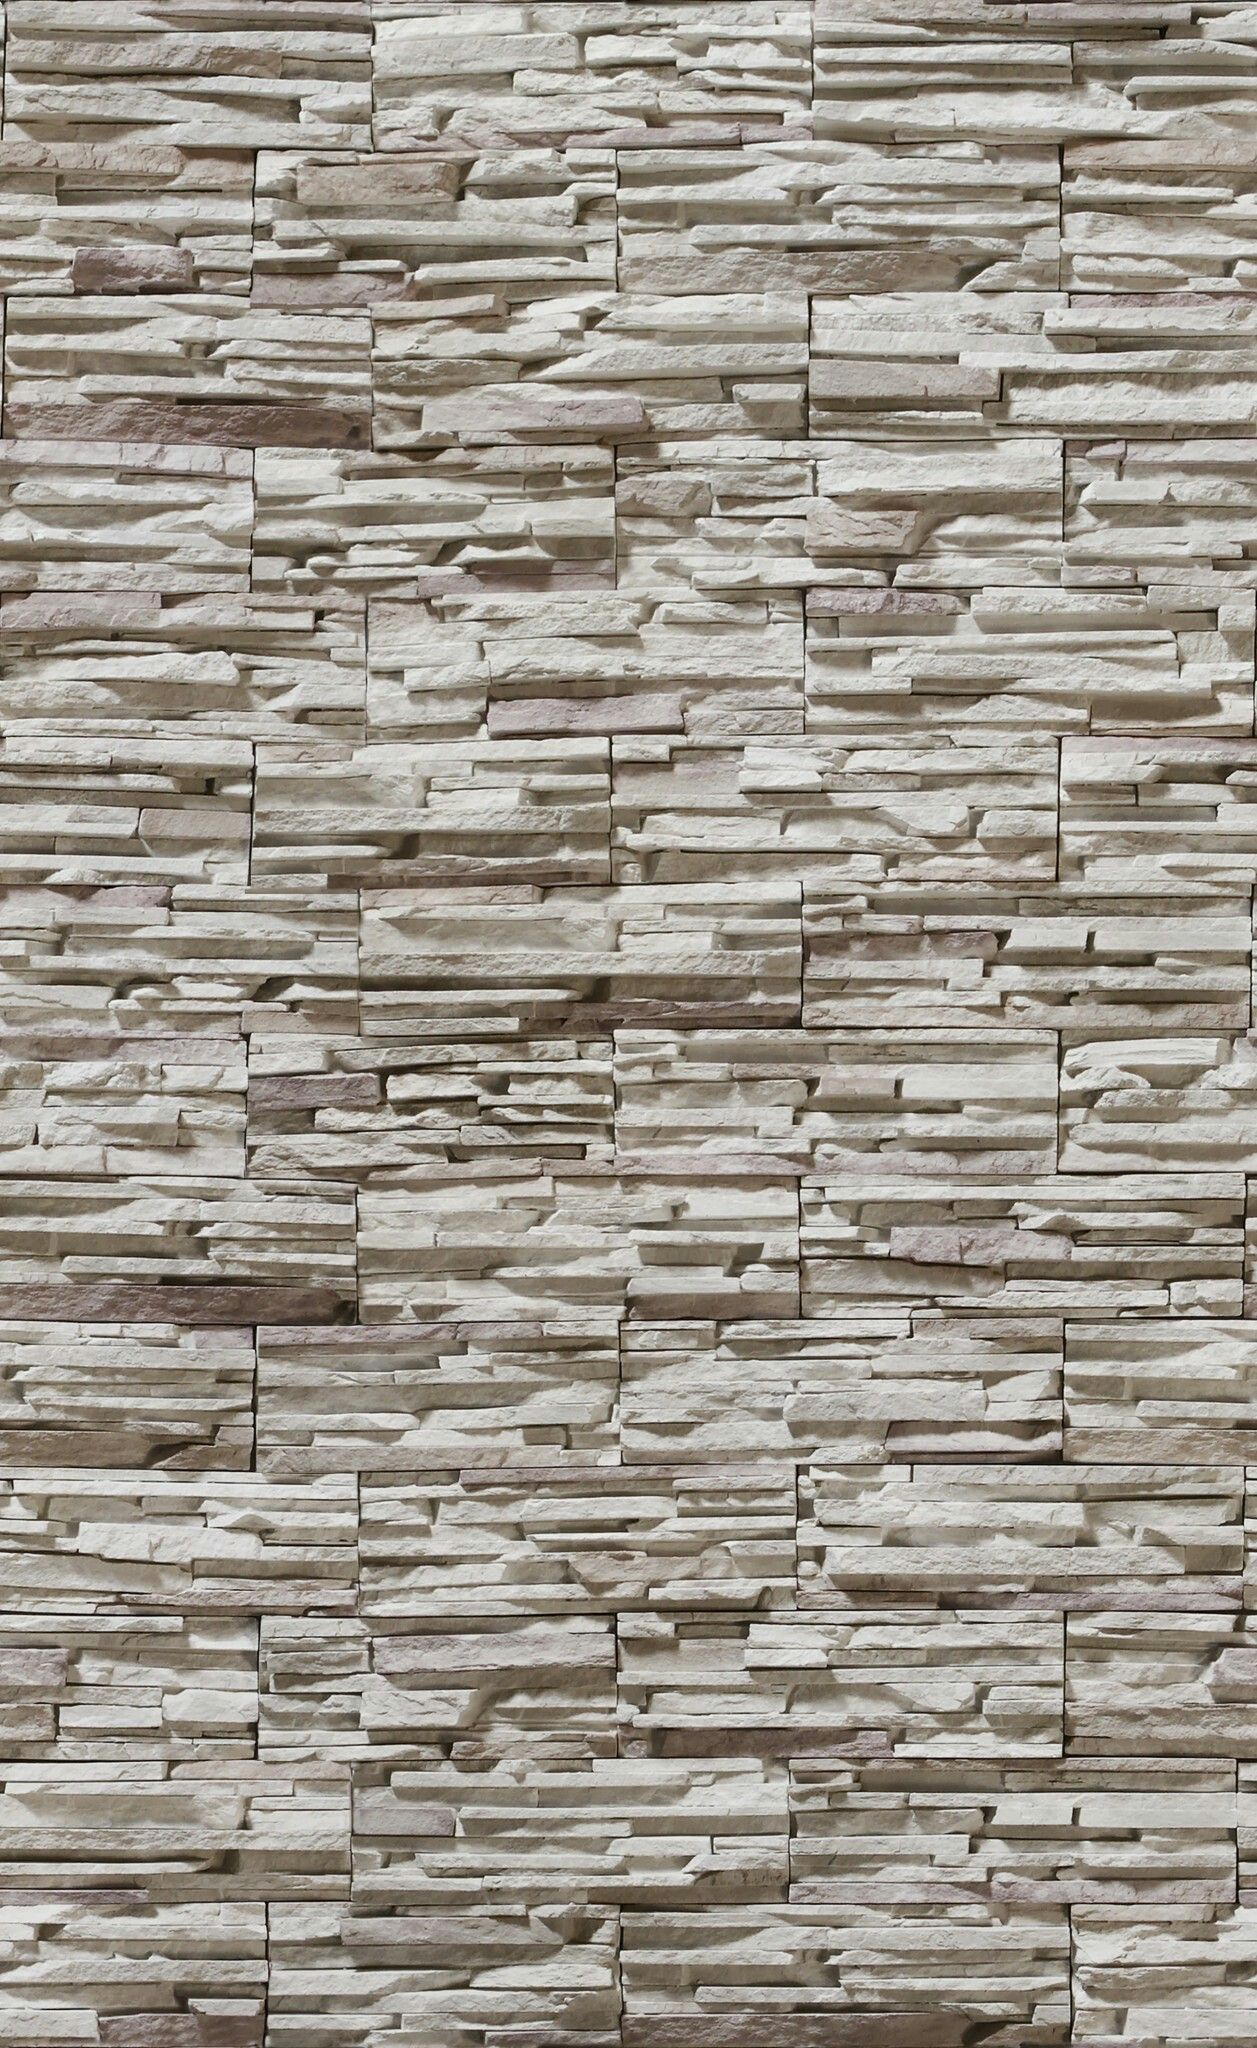 Textura Textura De Piedra Paredes Texturadas Revestimiento De